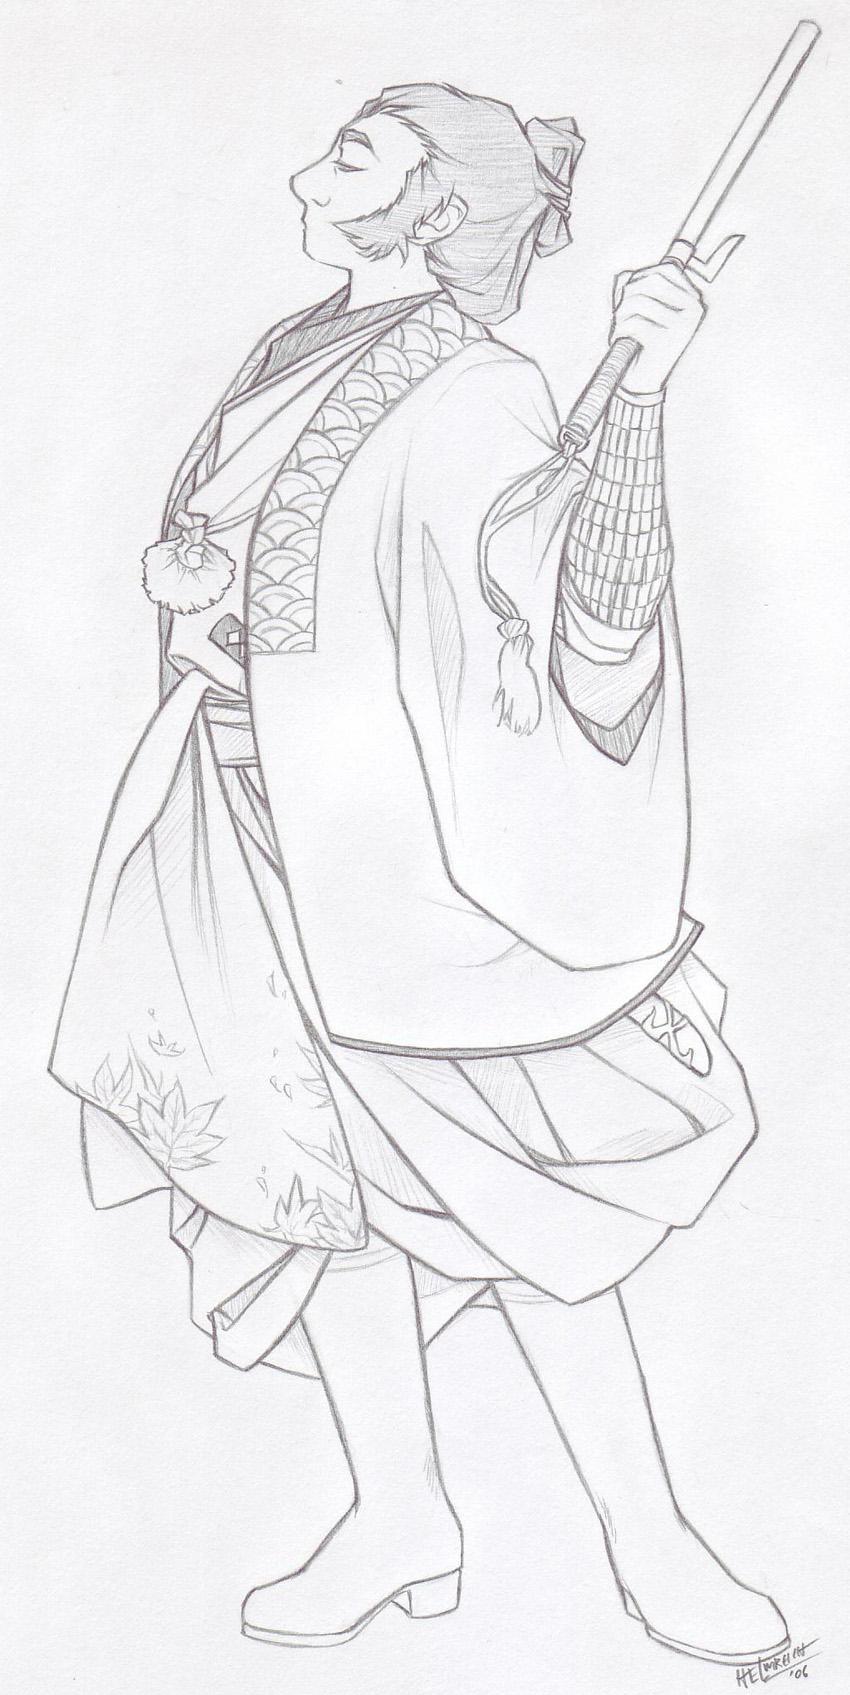 Javert makes hakama cool again by cillabub